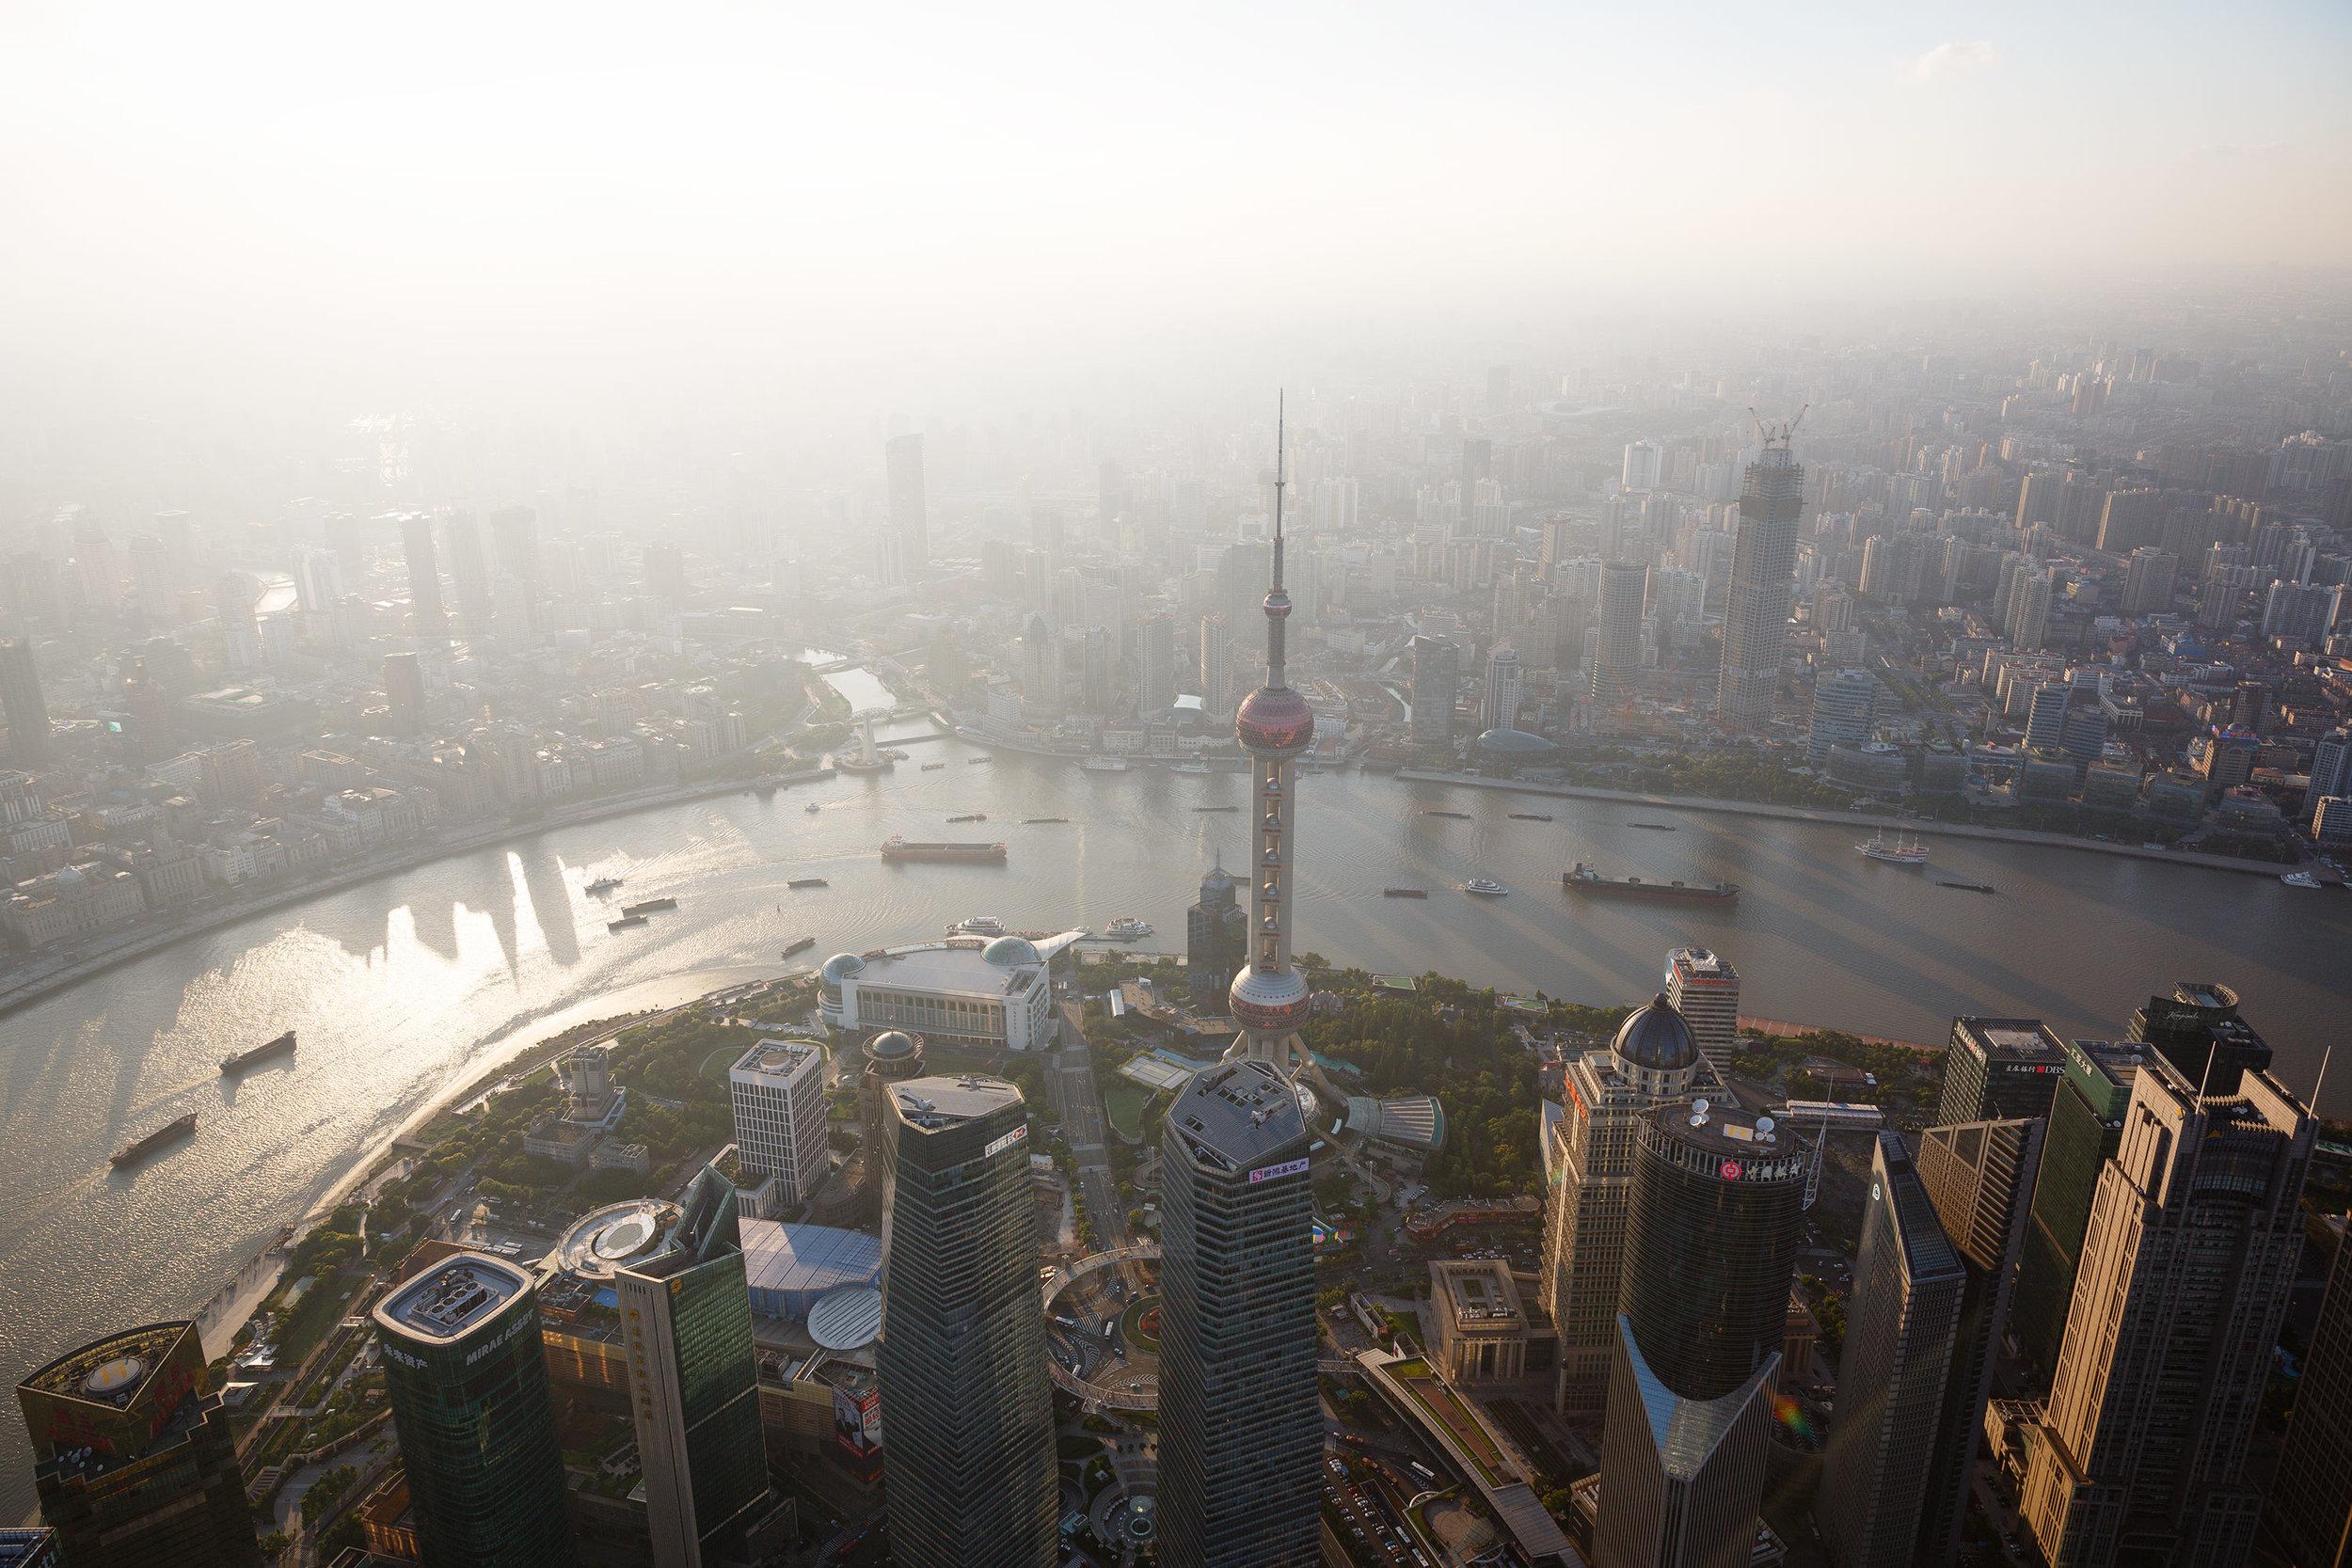 26_20140709_Shanghai_Tower_NS_05344-2.JPG